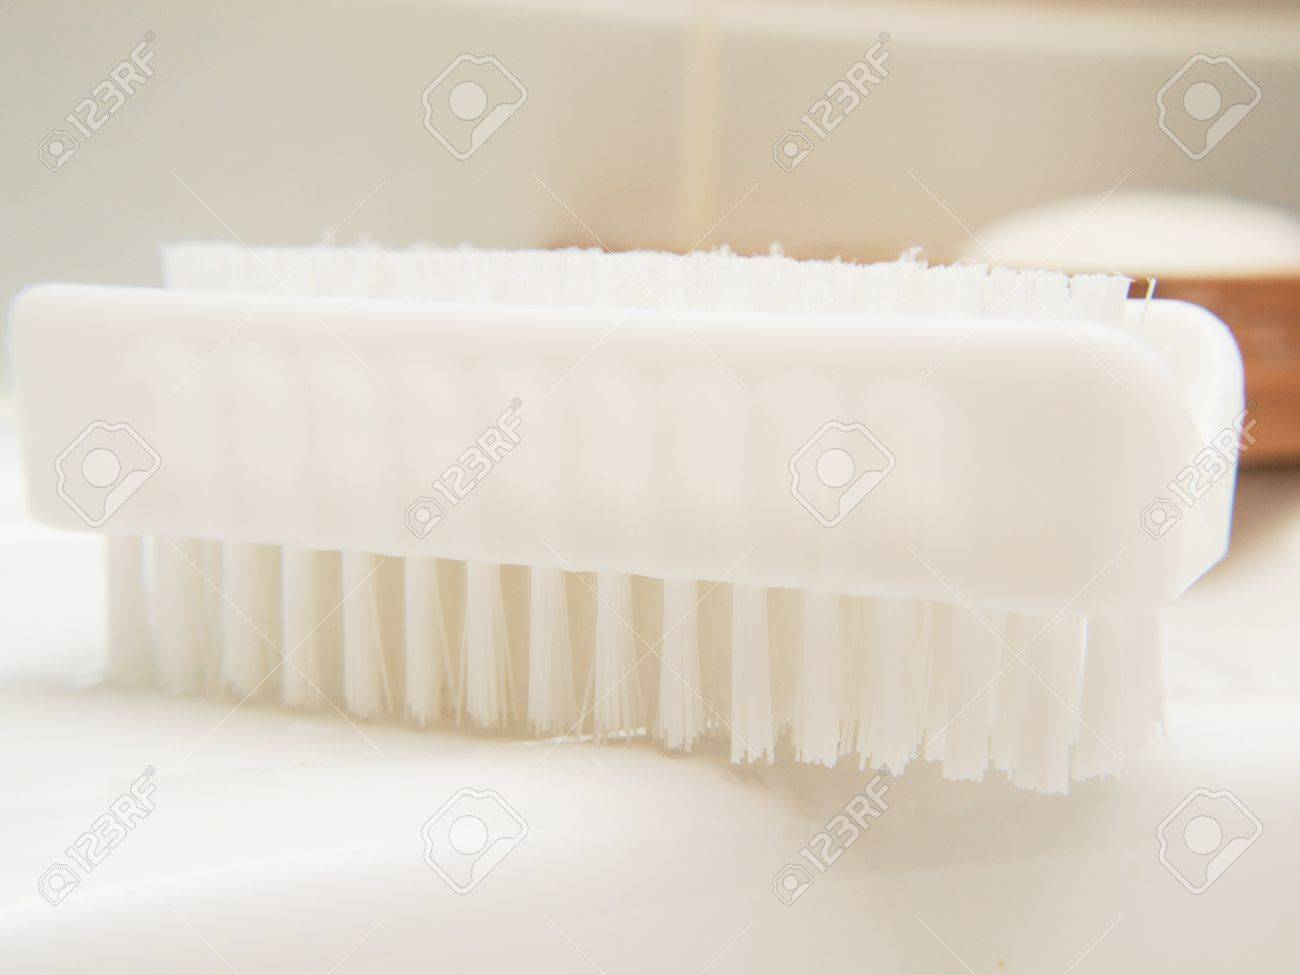 White nail brush, in bathroom, on sink, hygienic Stock Photo - 13040571